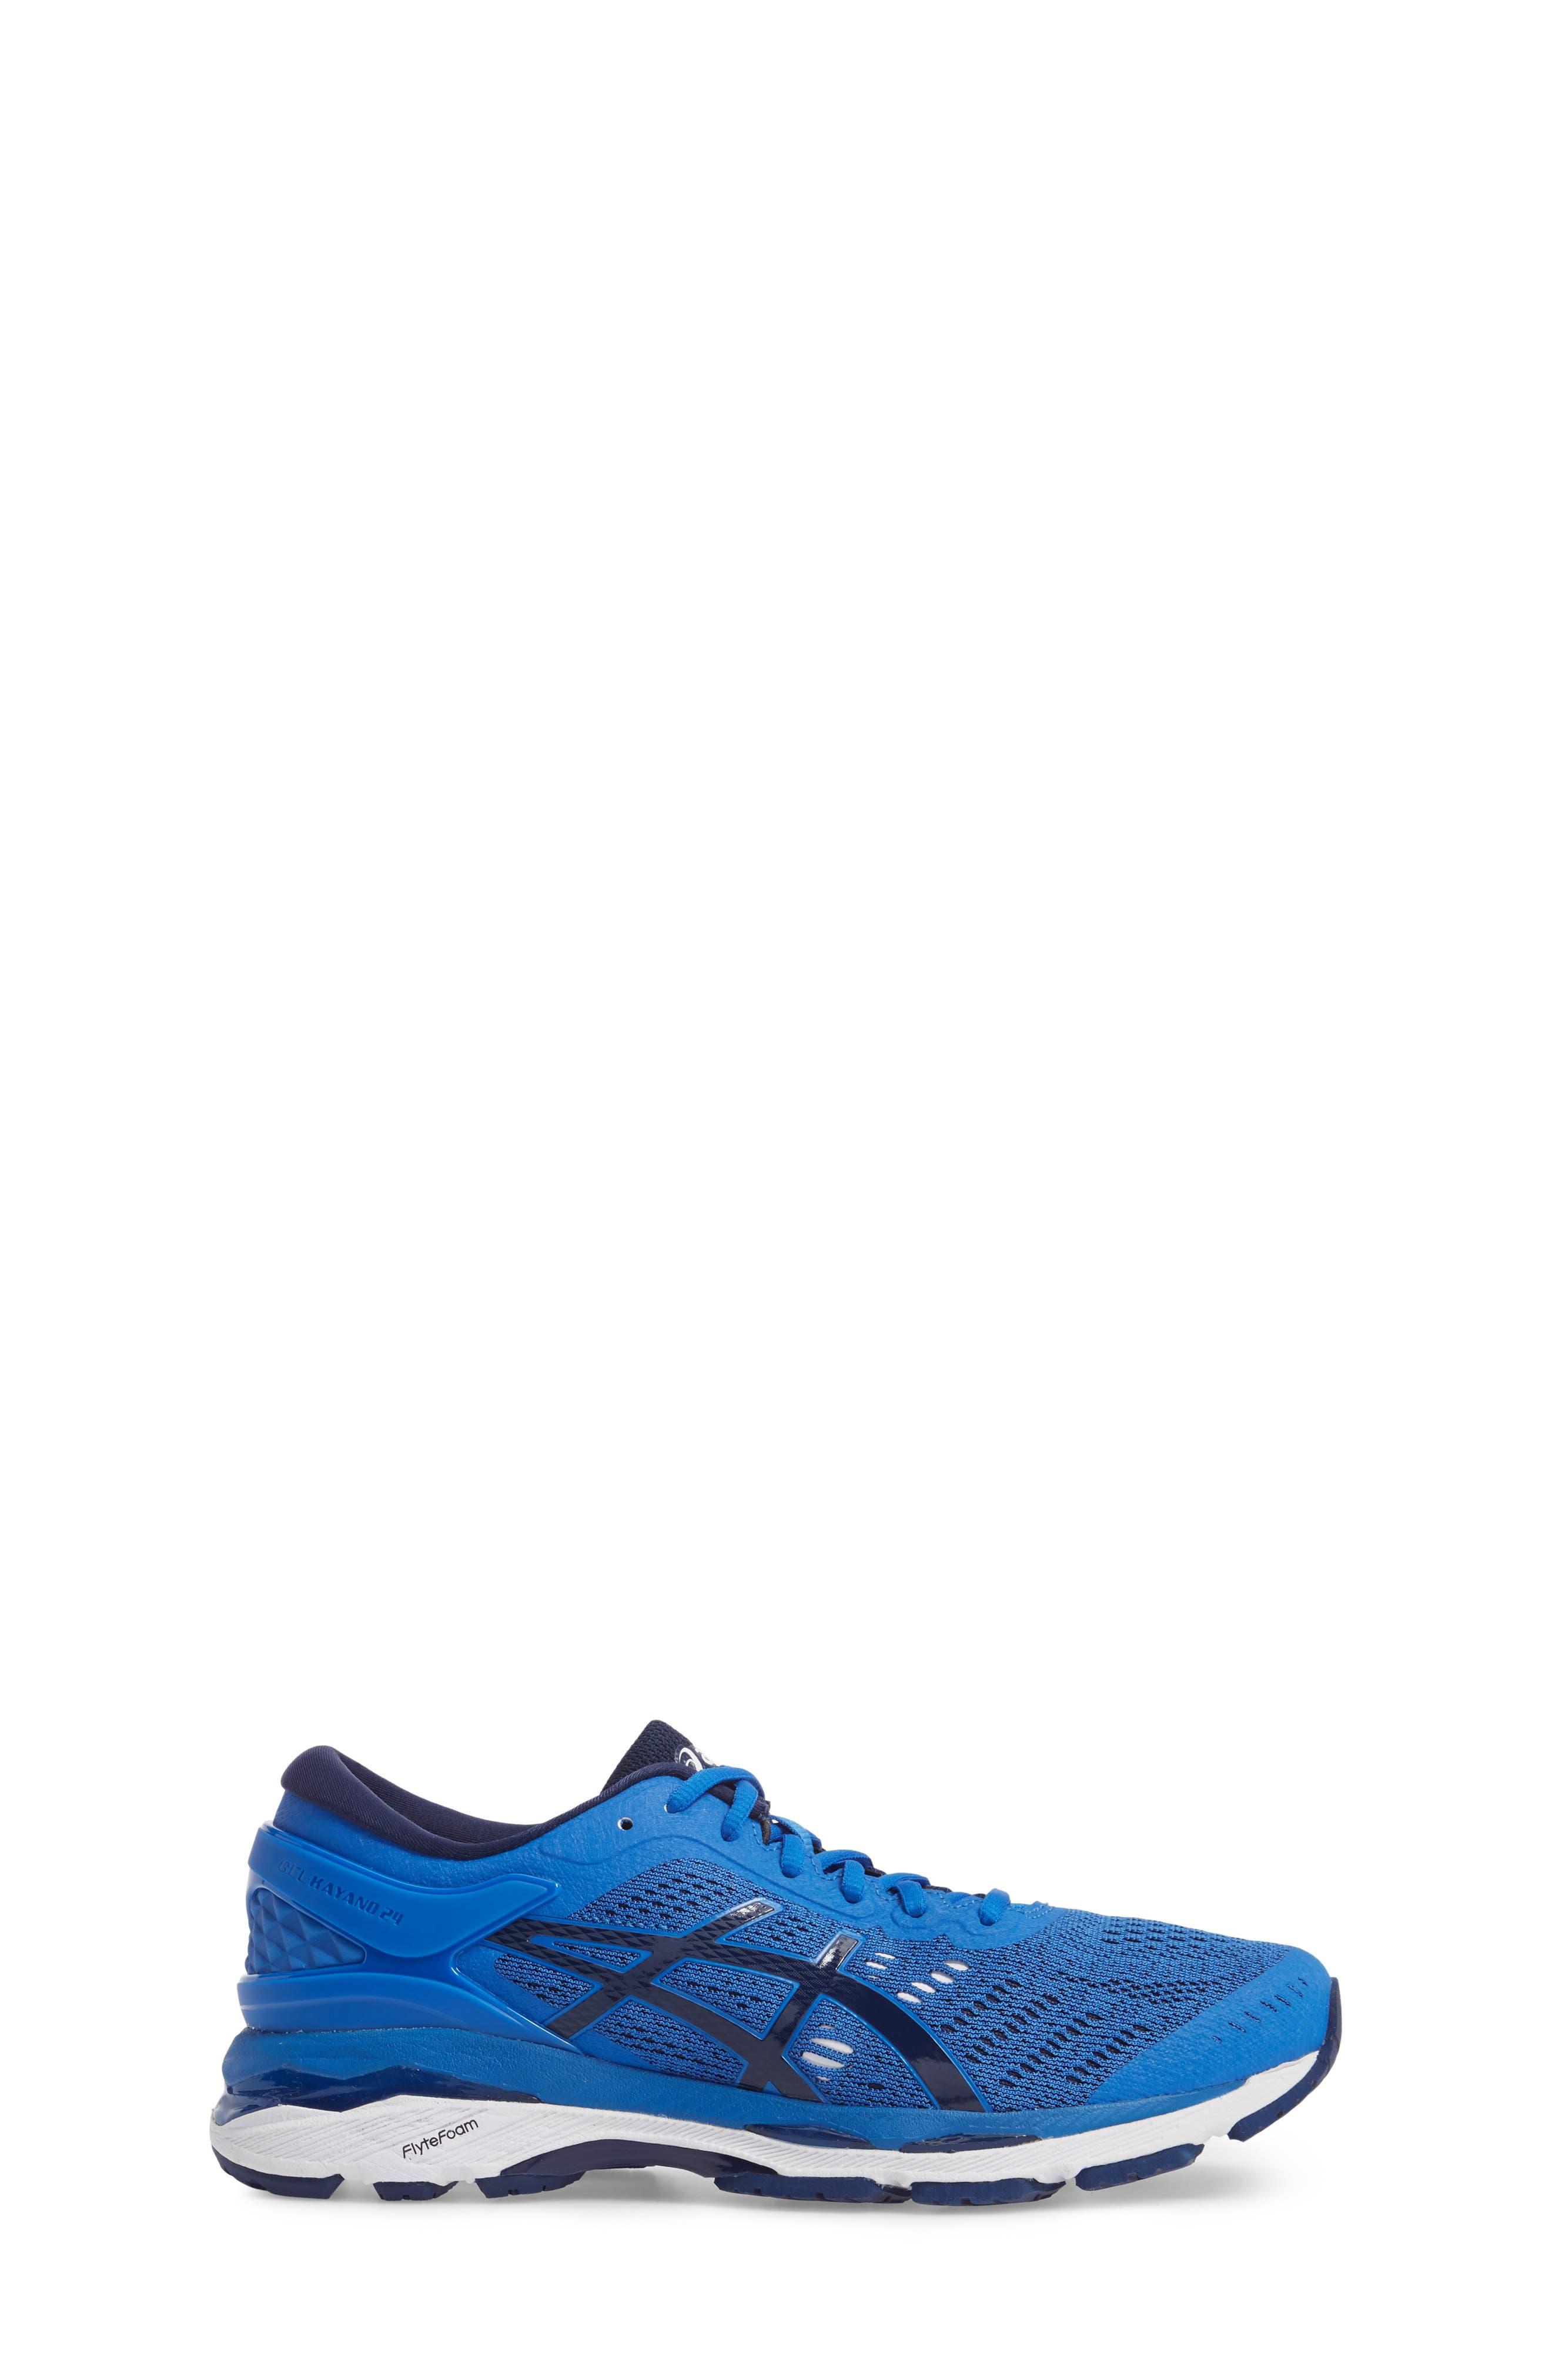 GEL-Kayano<sup>®</sup> 24 GS Running Shoe,                             Alternate thumbnail 3, color,                             454